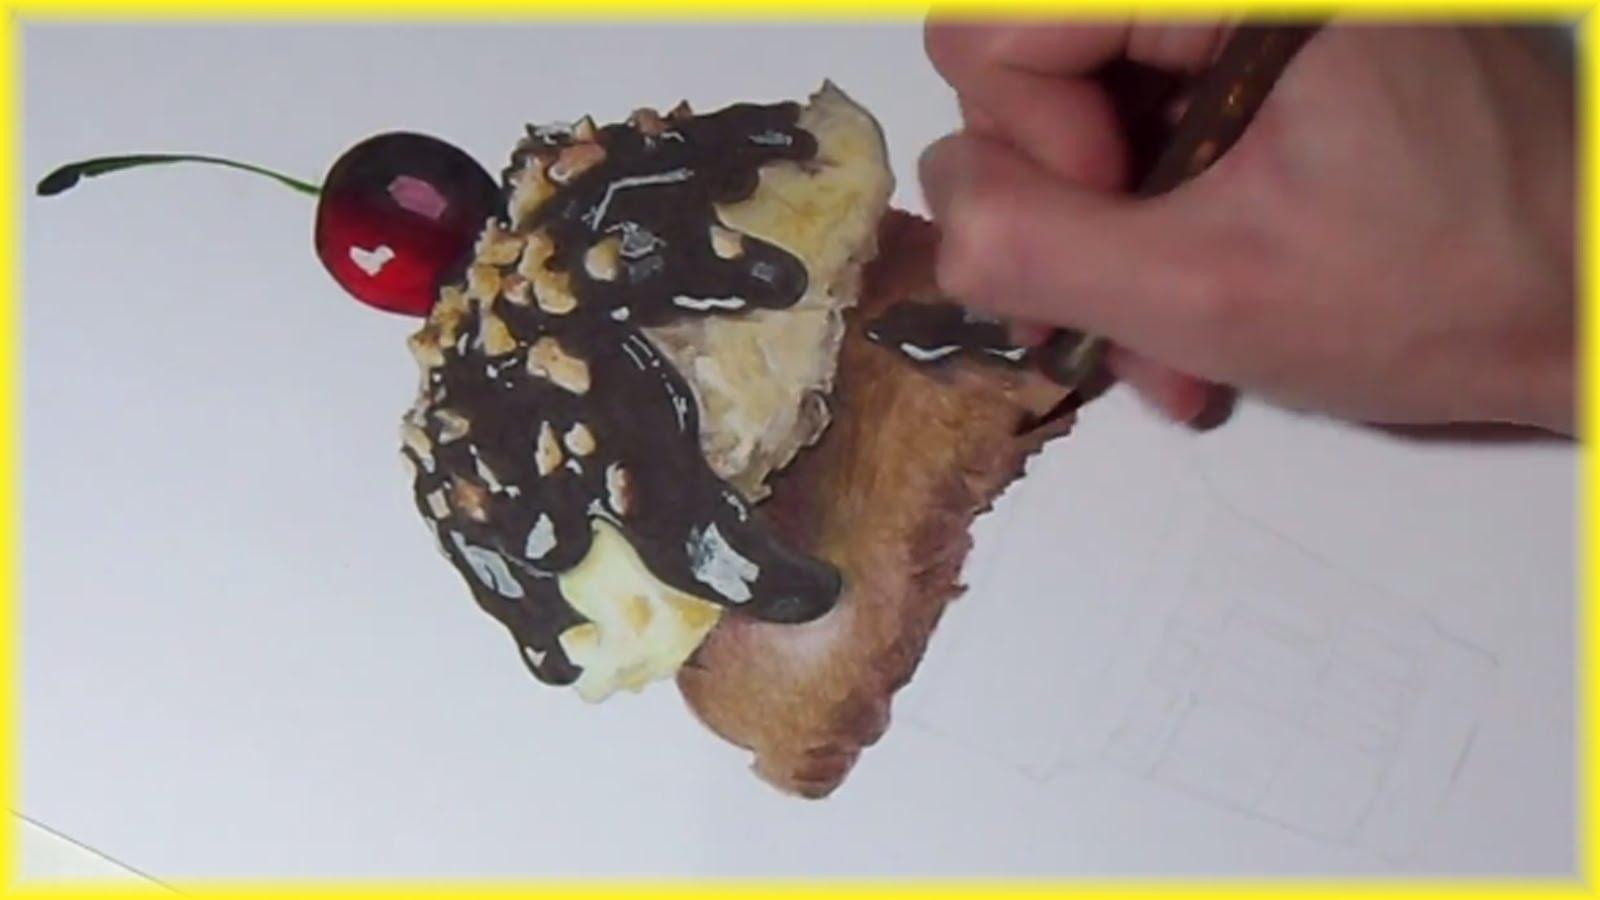 Drawn ice cream pencil drawing Cream Sundae! DRAWING: YouTube An